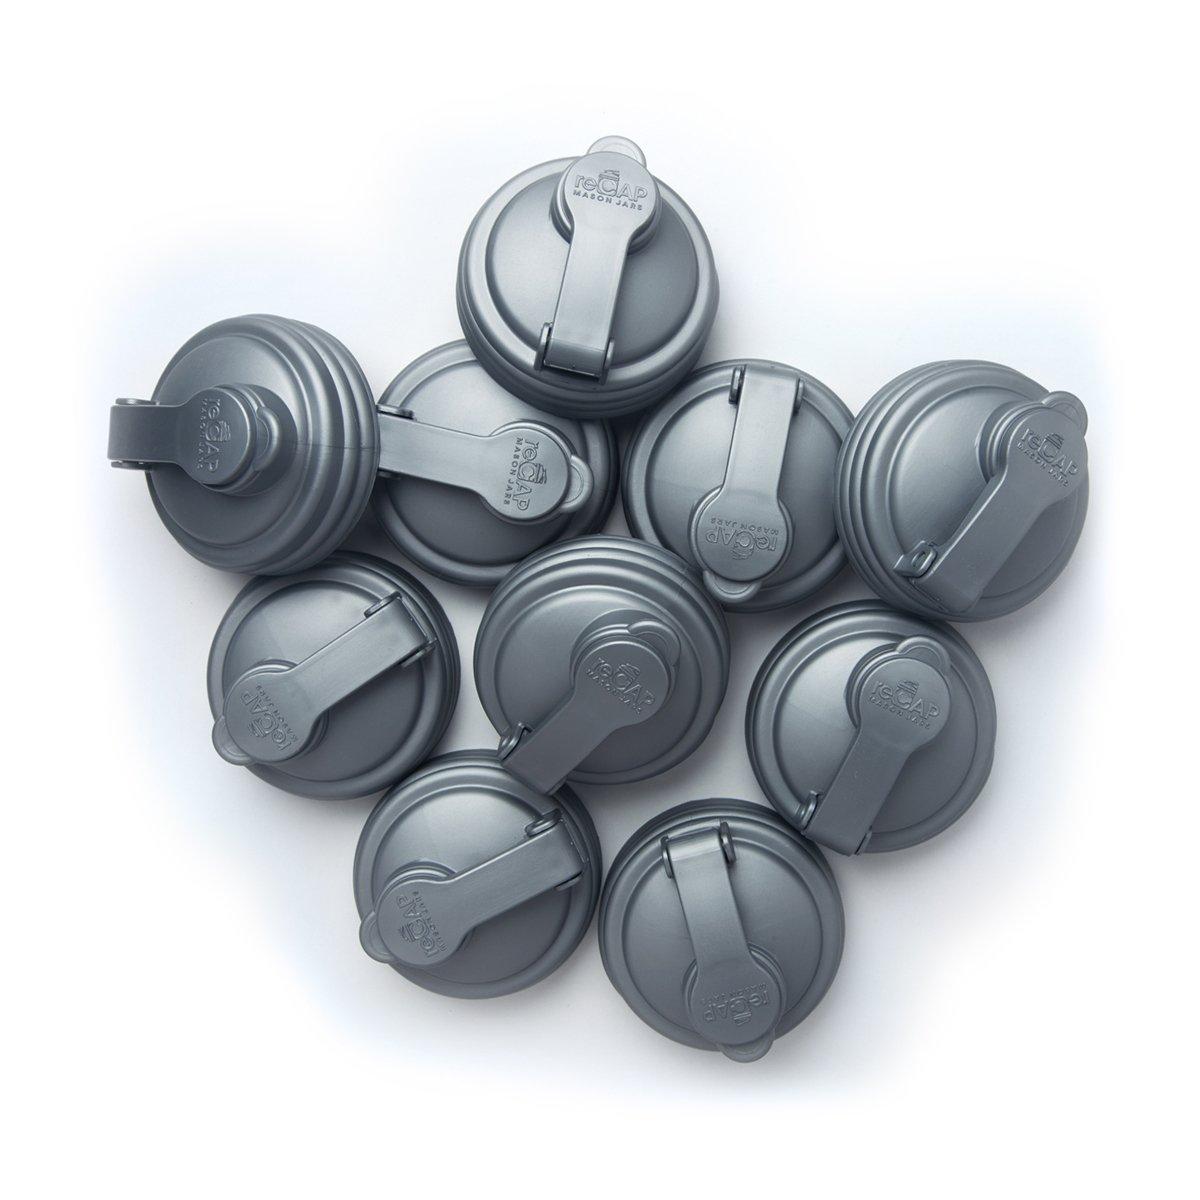 reCAP Mason Jars Lid POUR Cap, Regular Mouth, Silver, 10 Pack